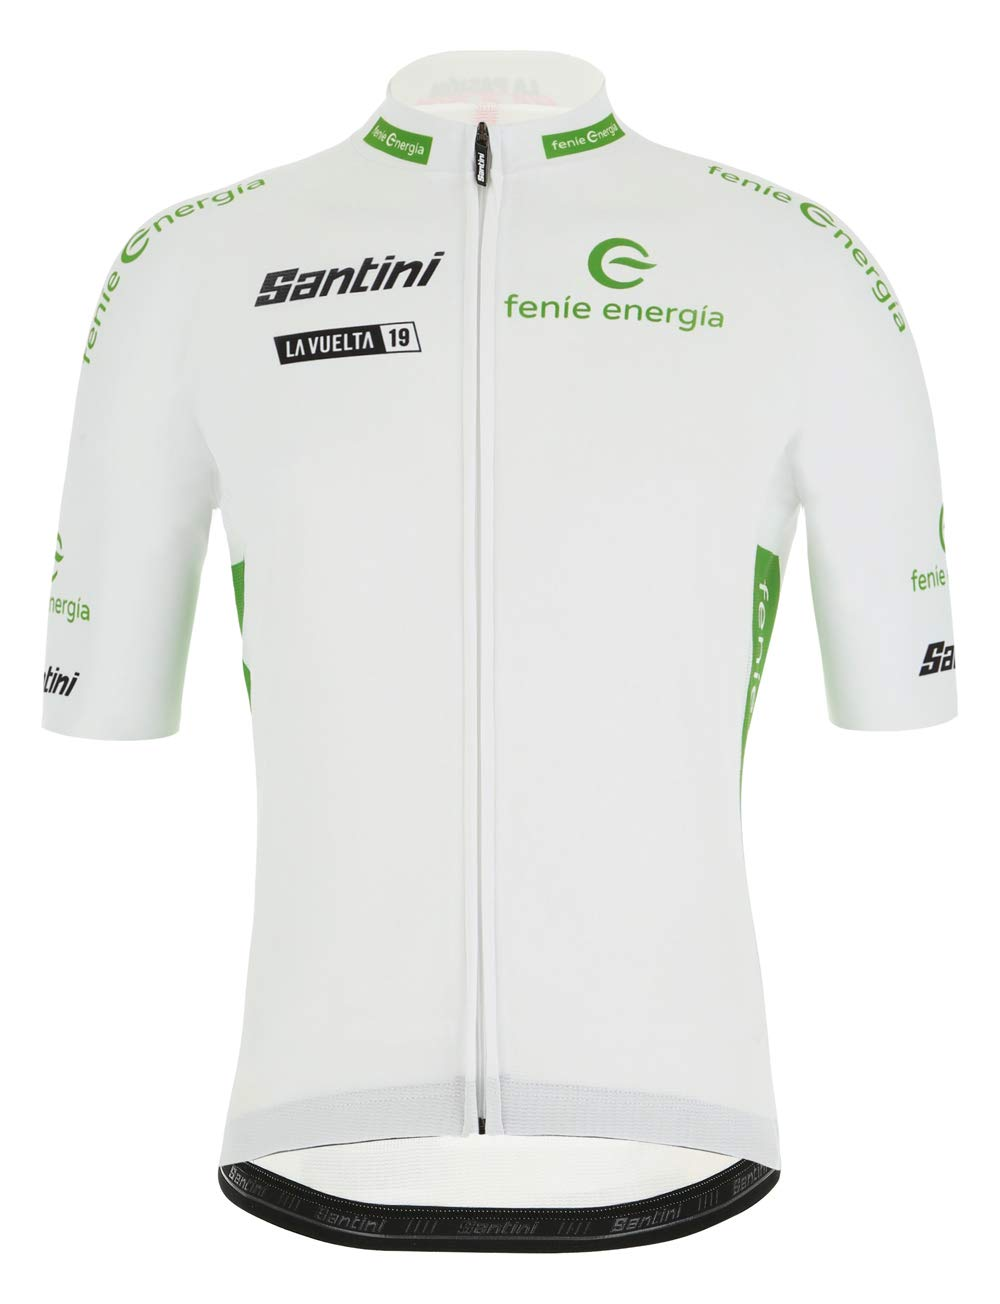 Santini - La Vuelta 2019 - Best Young Rider, Camiseta de Manga Corta para Hombre, Hombre, RE9427519LV, Bianco, XX-Large: Amazon.es: Deportes y aire libre